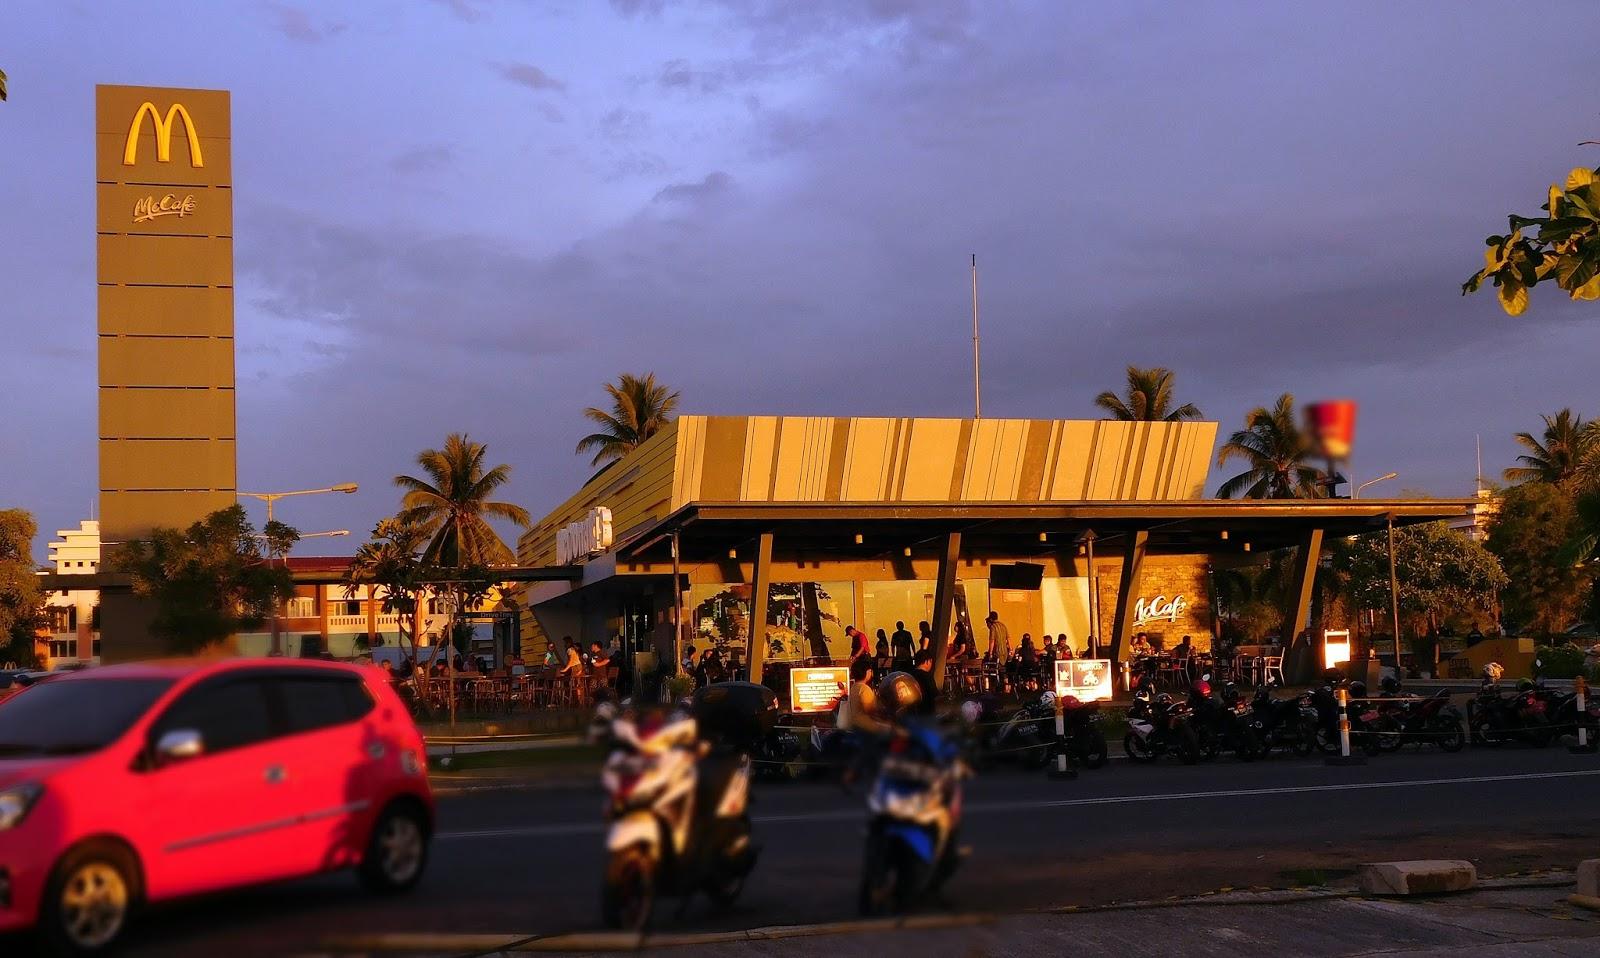 Manado City Mcdonald Berada Jalan Boulevard 2 Kota Sulawesi Utara